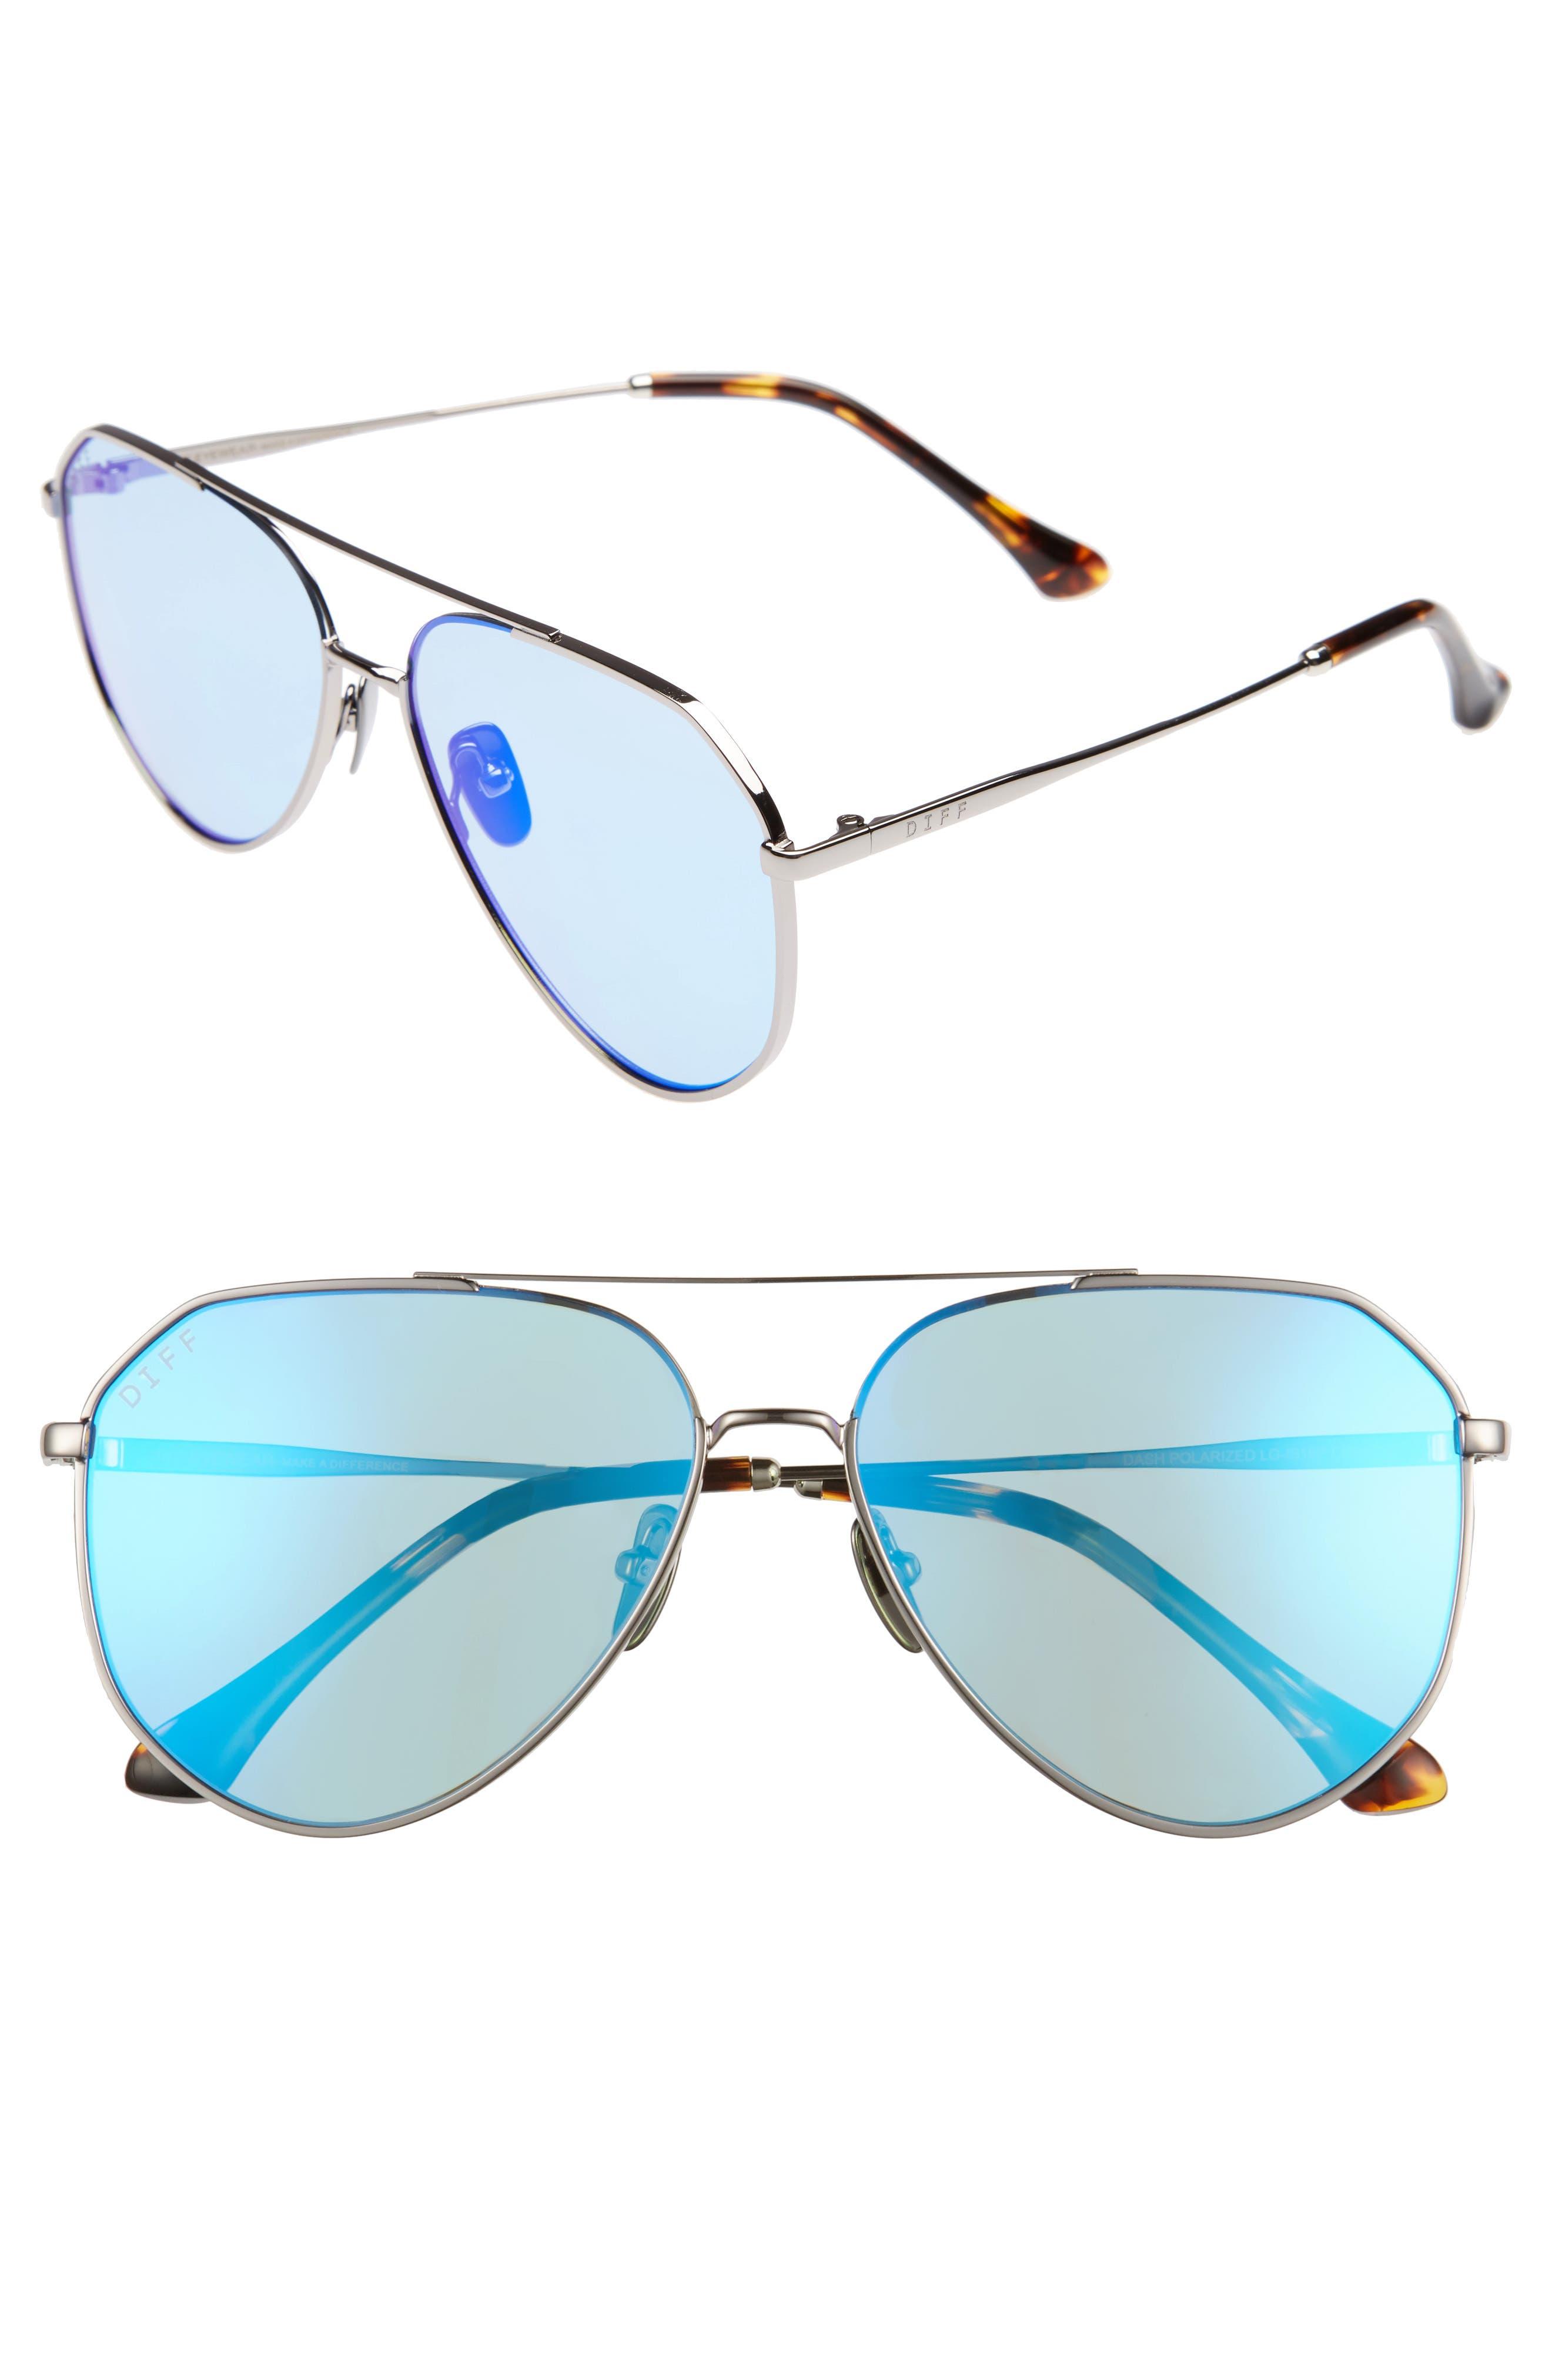 Dash 61mm Polarized Aviator Sunglasses,                             Main thumbnail 1, color,                             GUNMETAL/ ICE BLUE